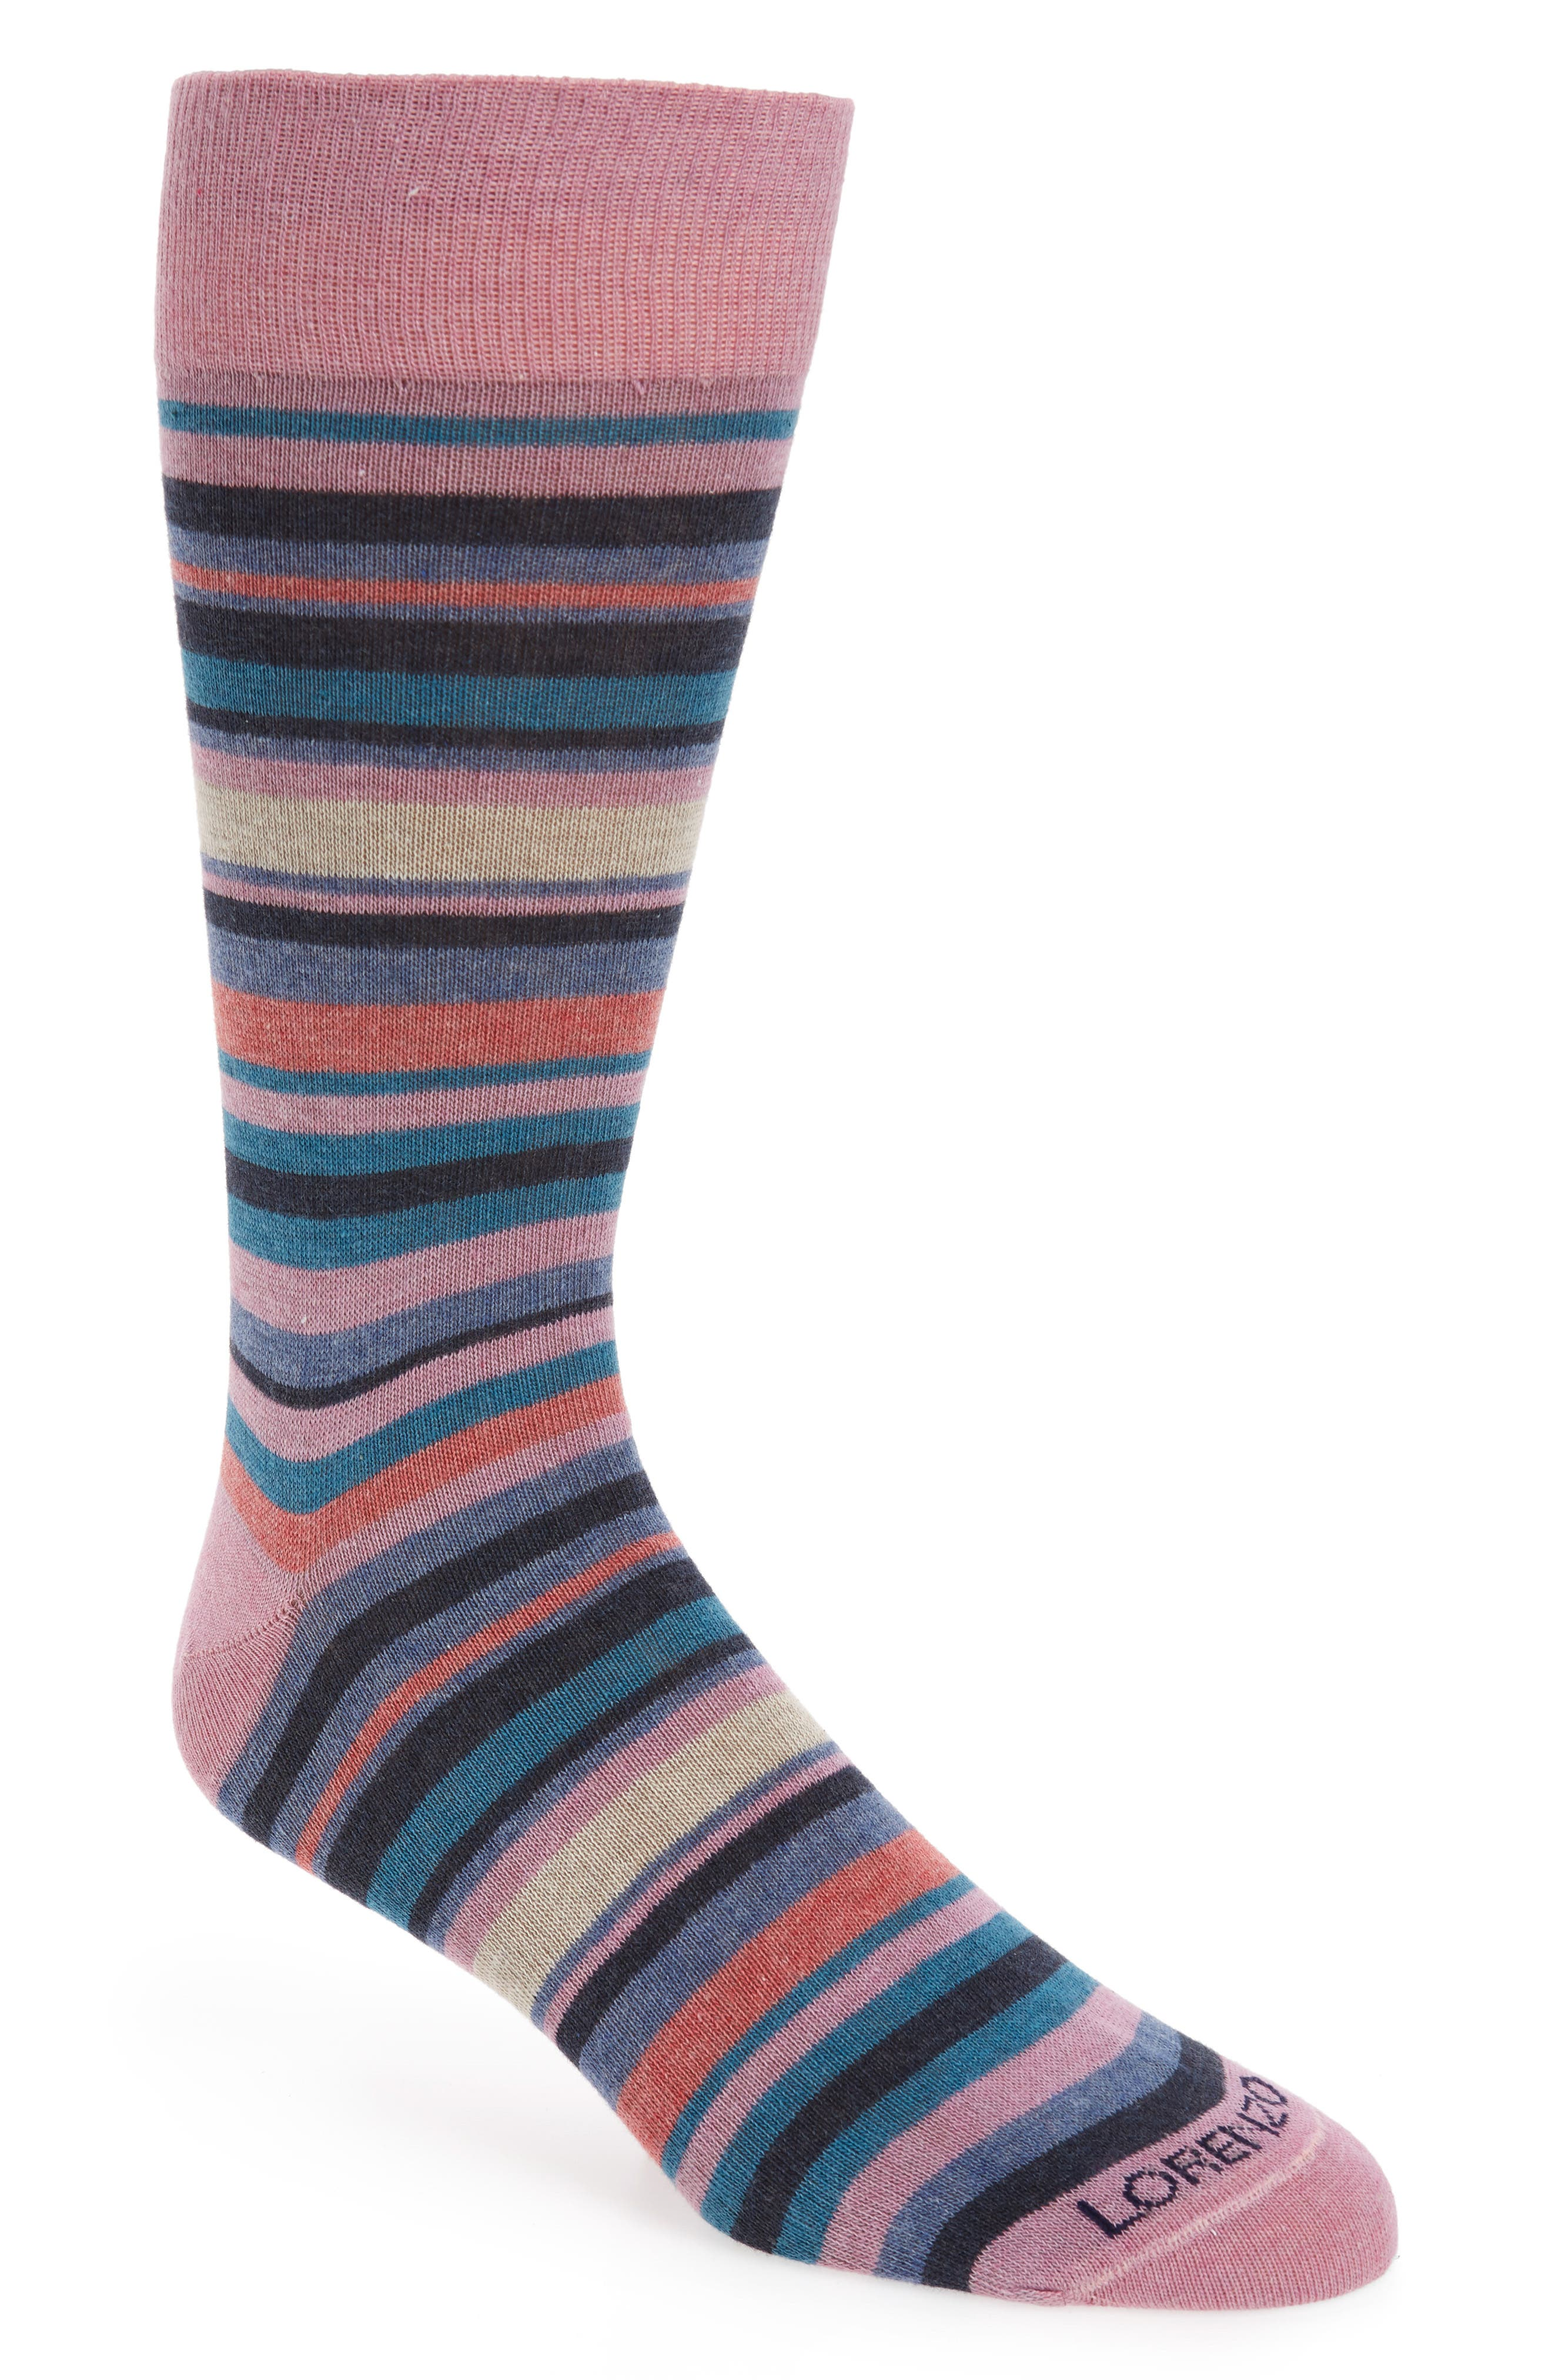 Lorenzo Uomo Stripe Cotton Blend Socks